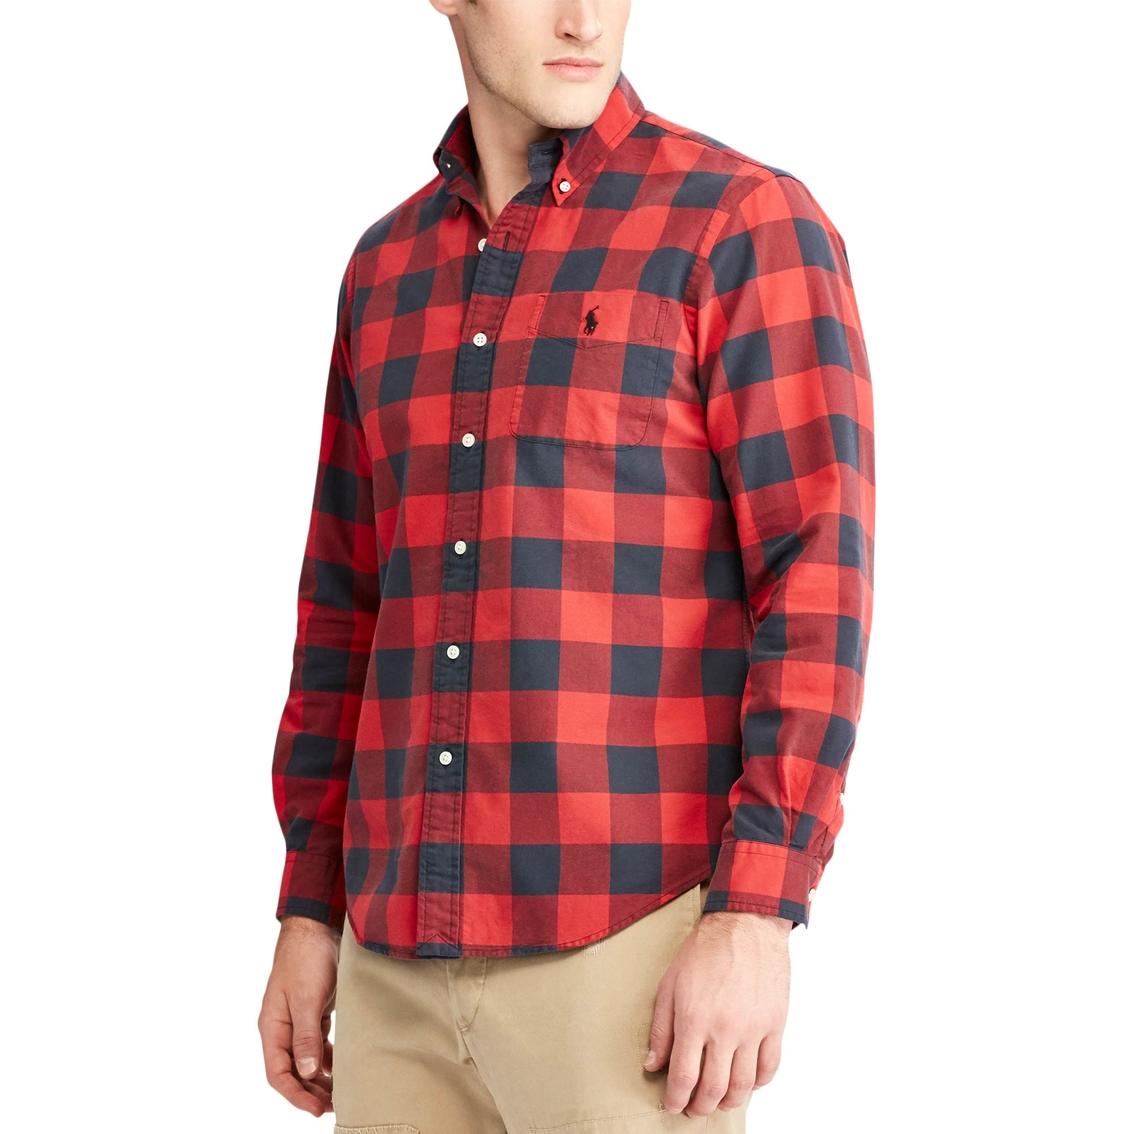 43c27a00d Polo Ralph Lauren The Iconic Plaid Oxford Shirt